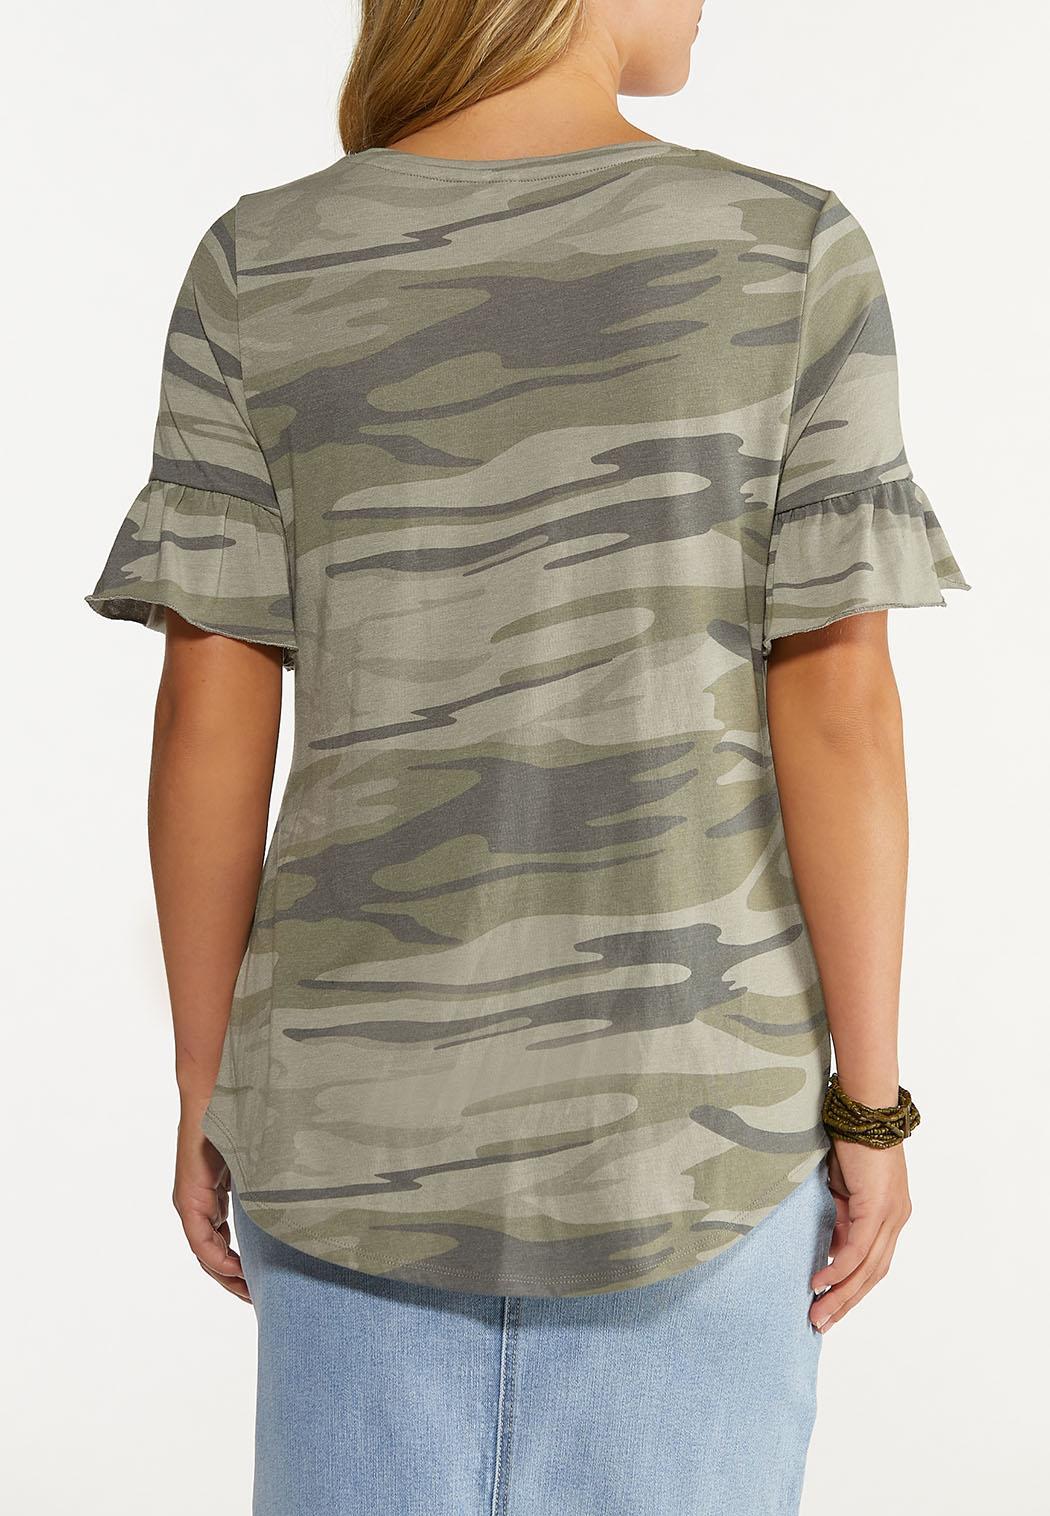 Plus Size Camo Ruffled Sleeve Tee (Item #44640265)